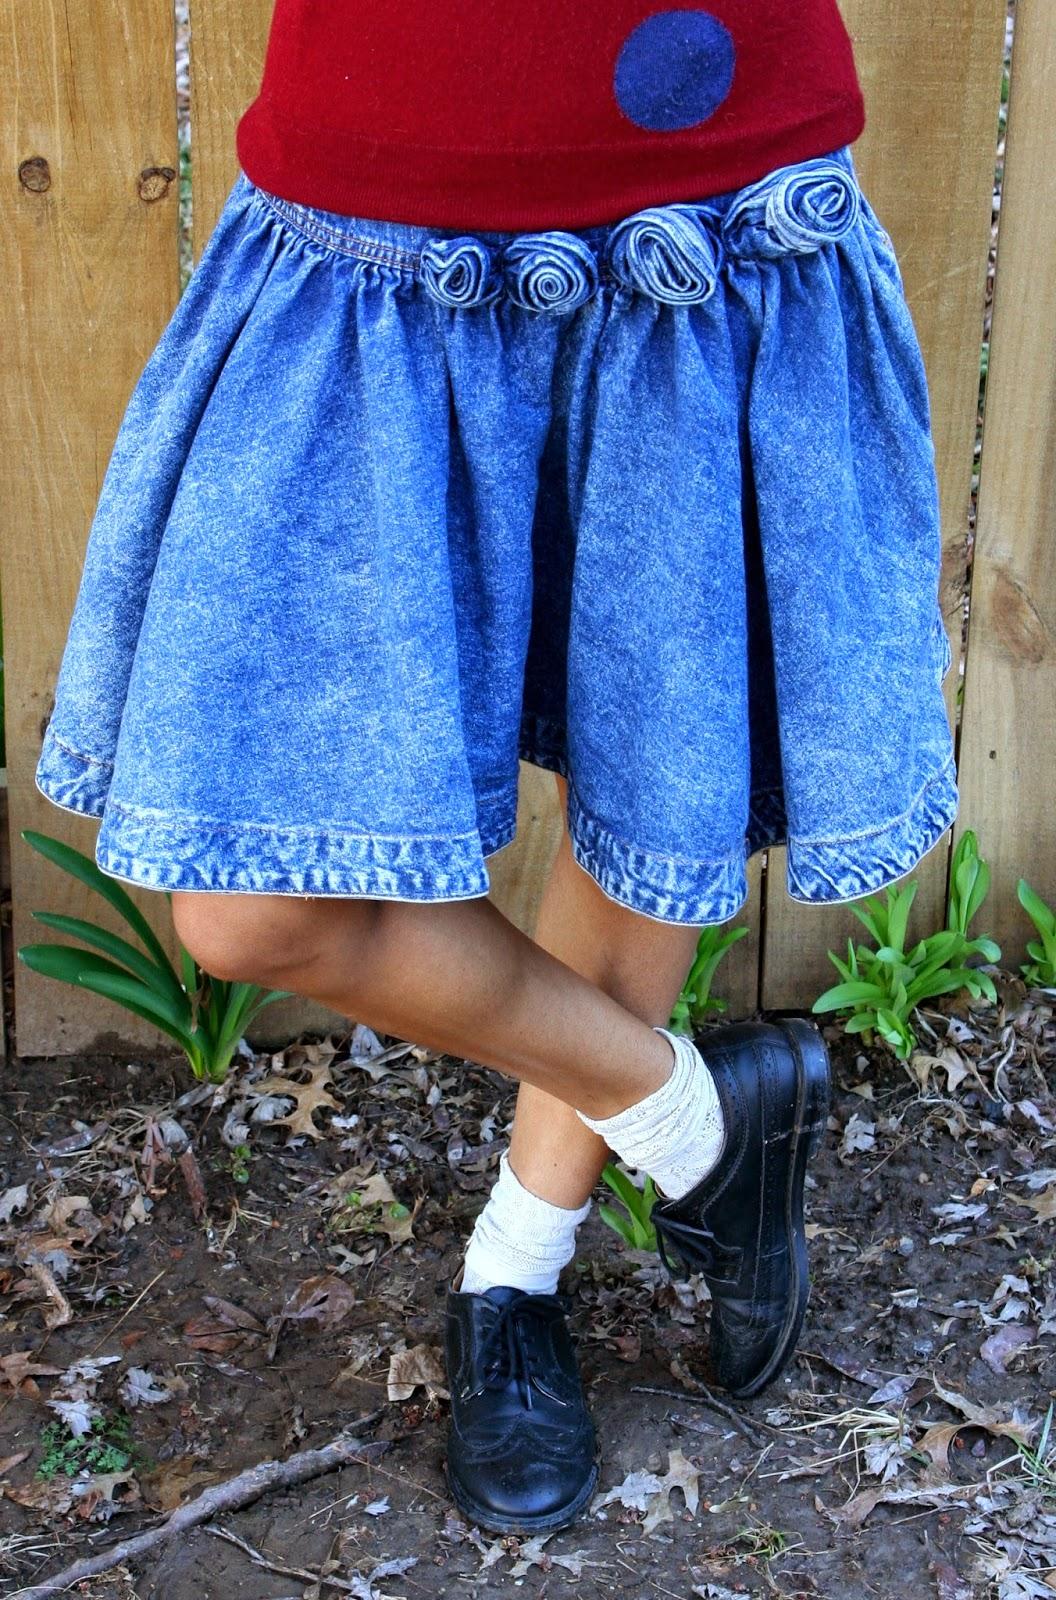 denim skirt and oxfords